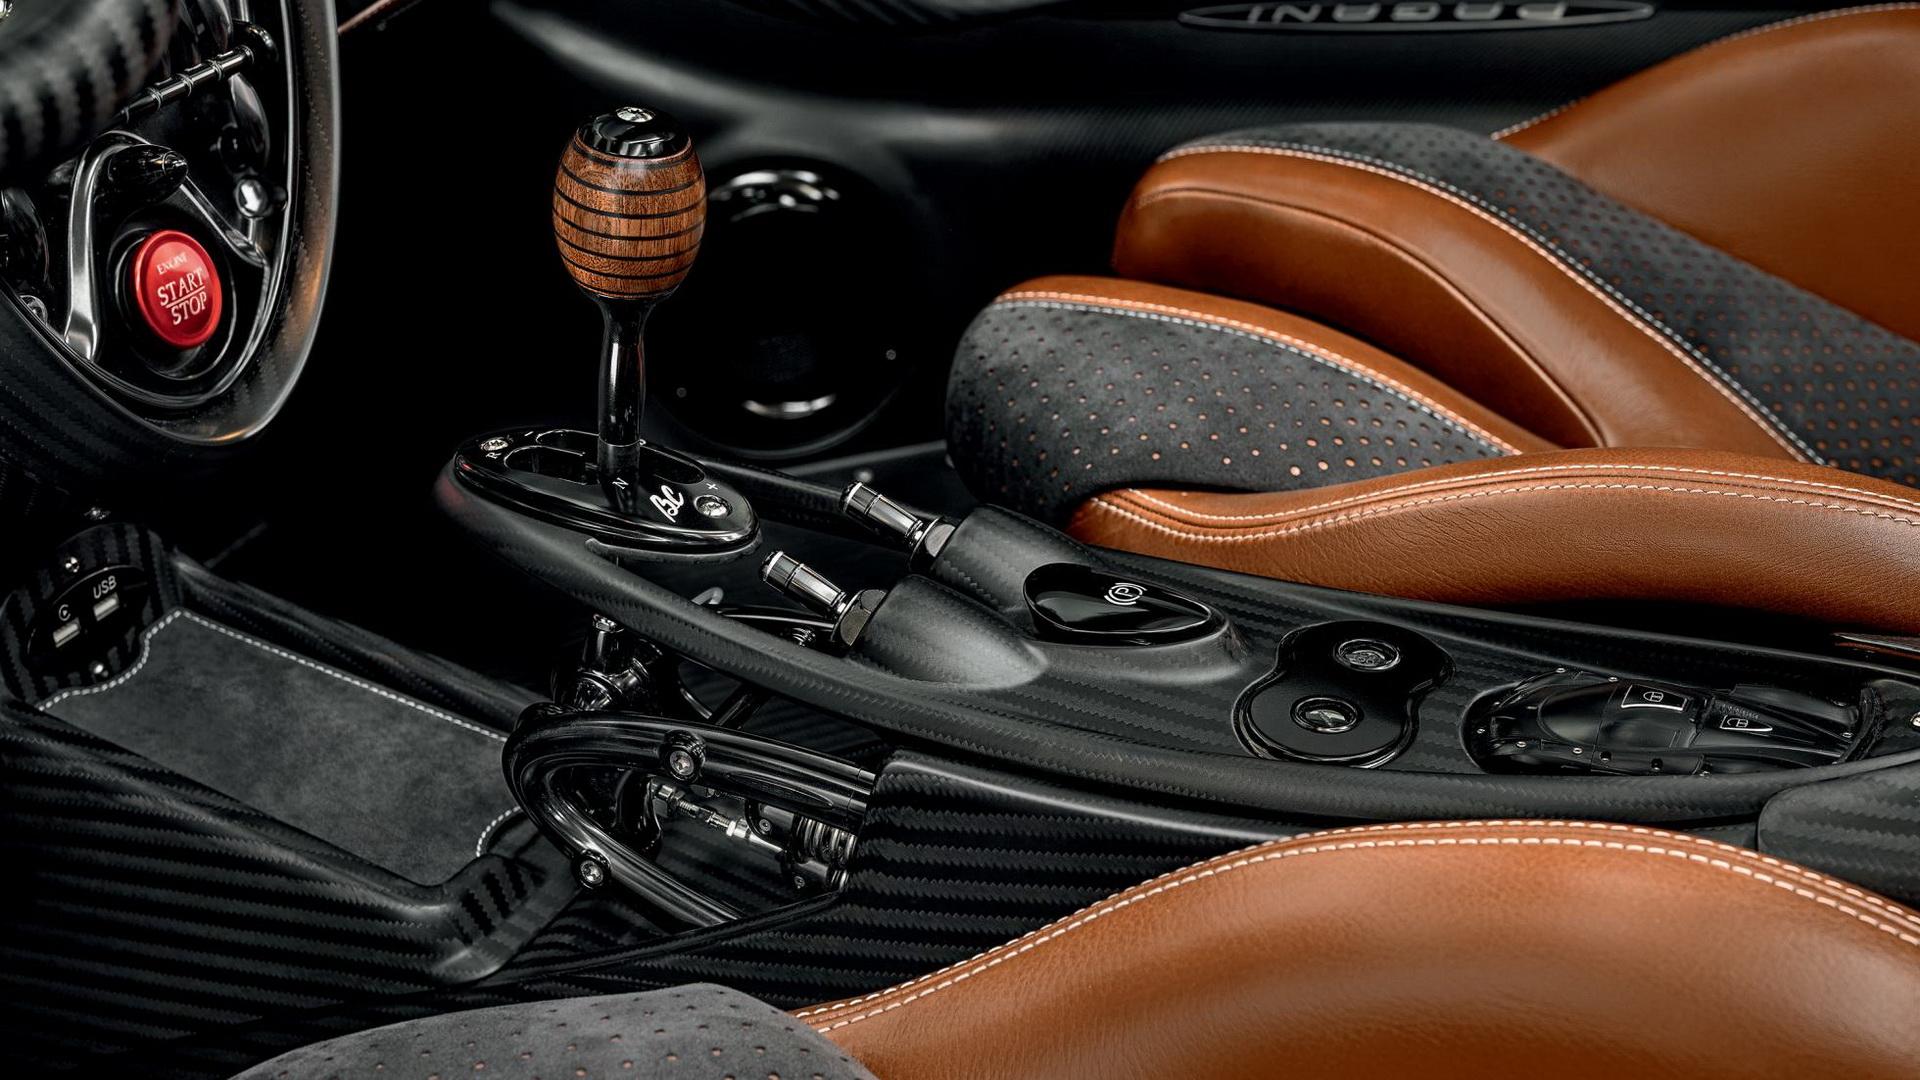 5e50511e-pagani-huayra-roadster-bc-11.jpg